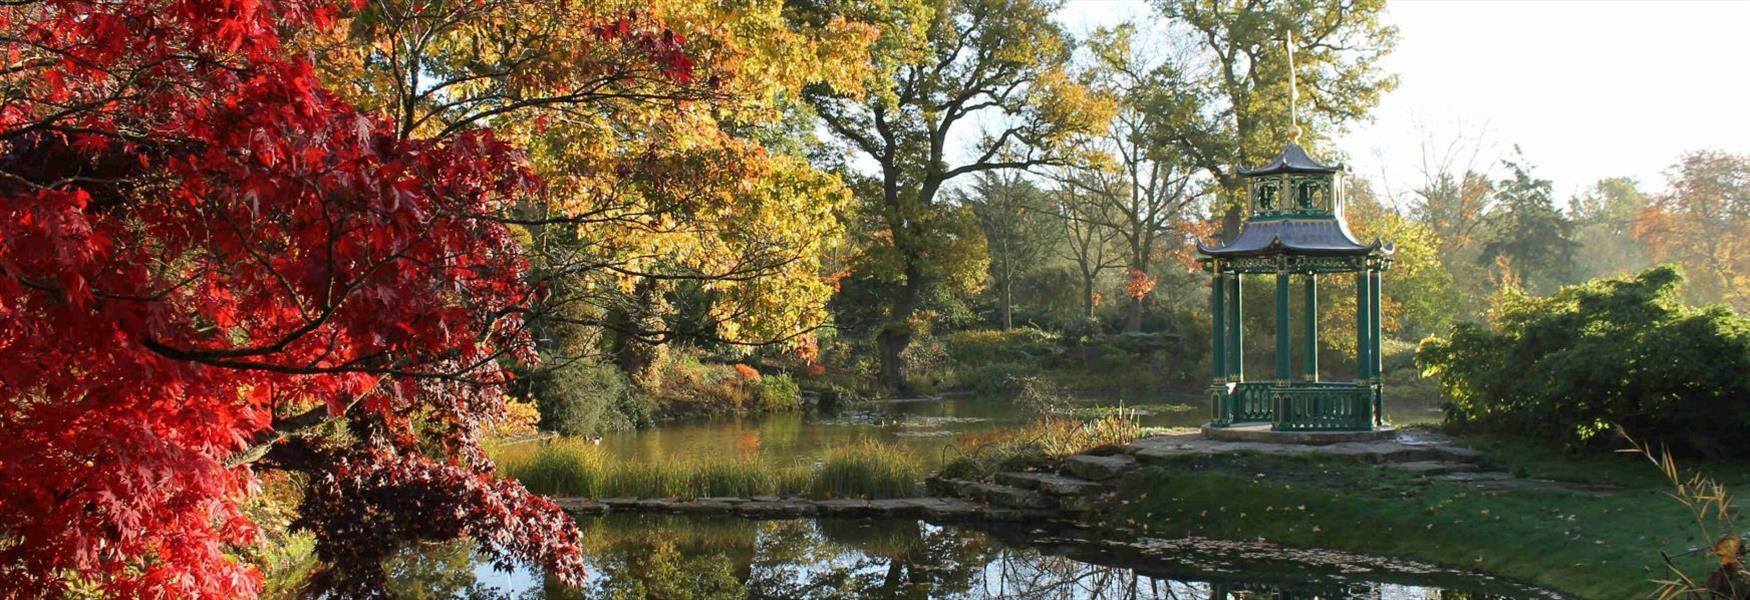 Autumn at Cliveden